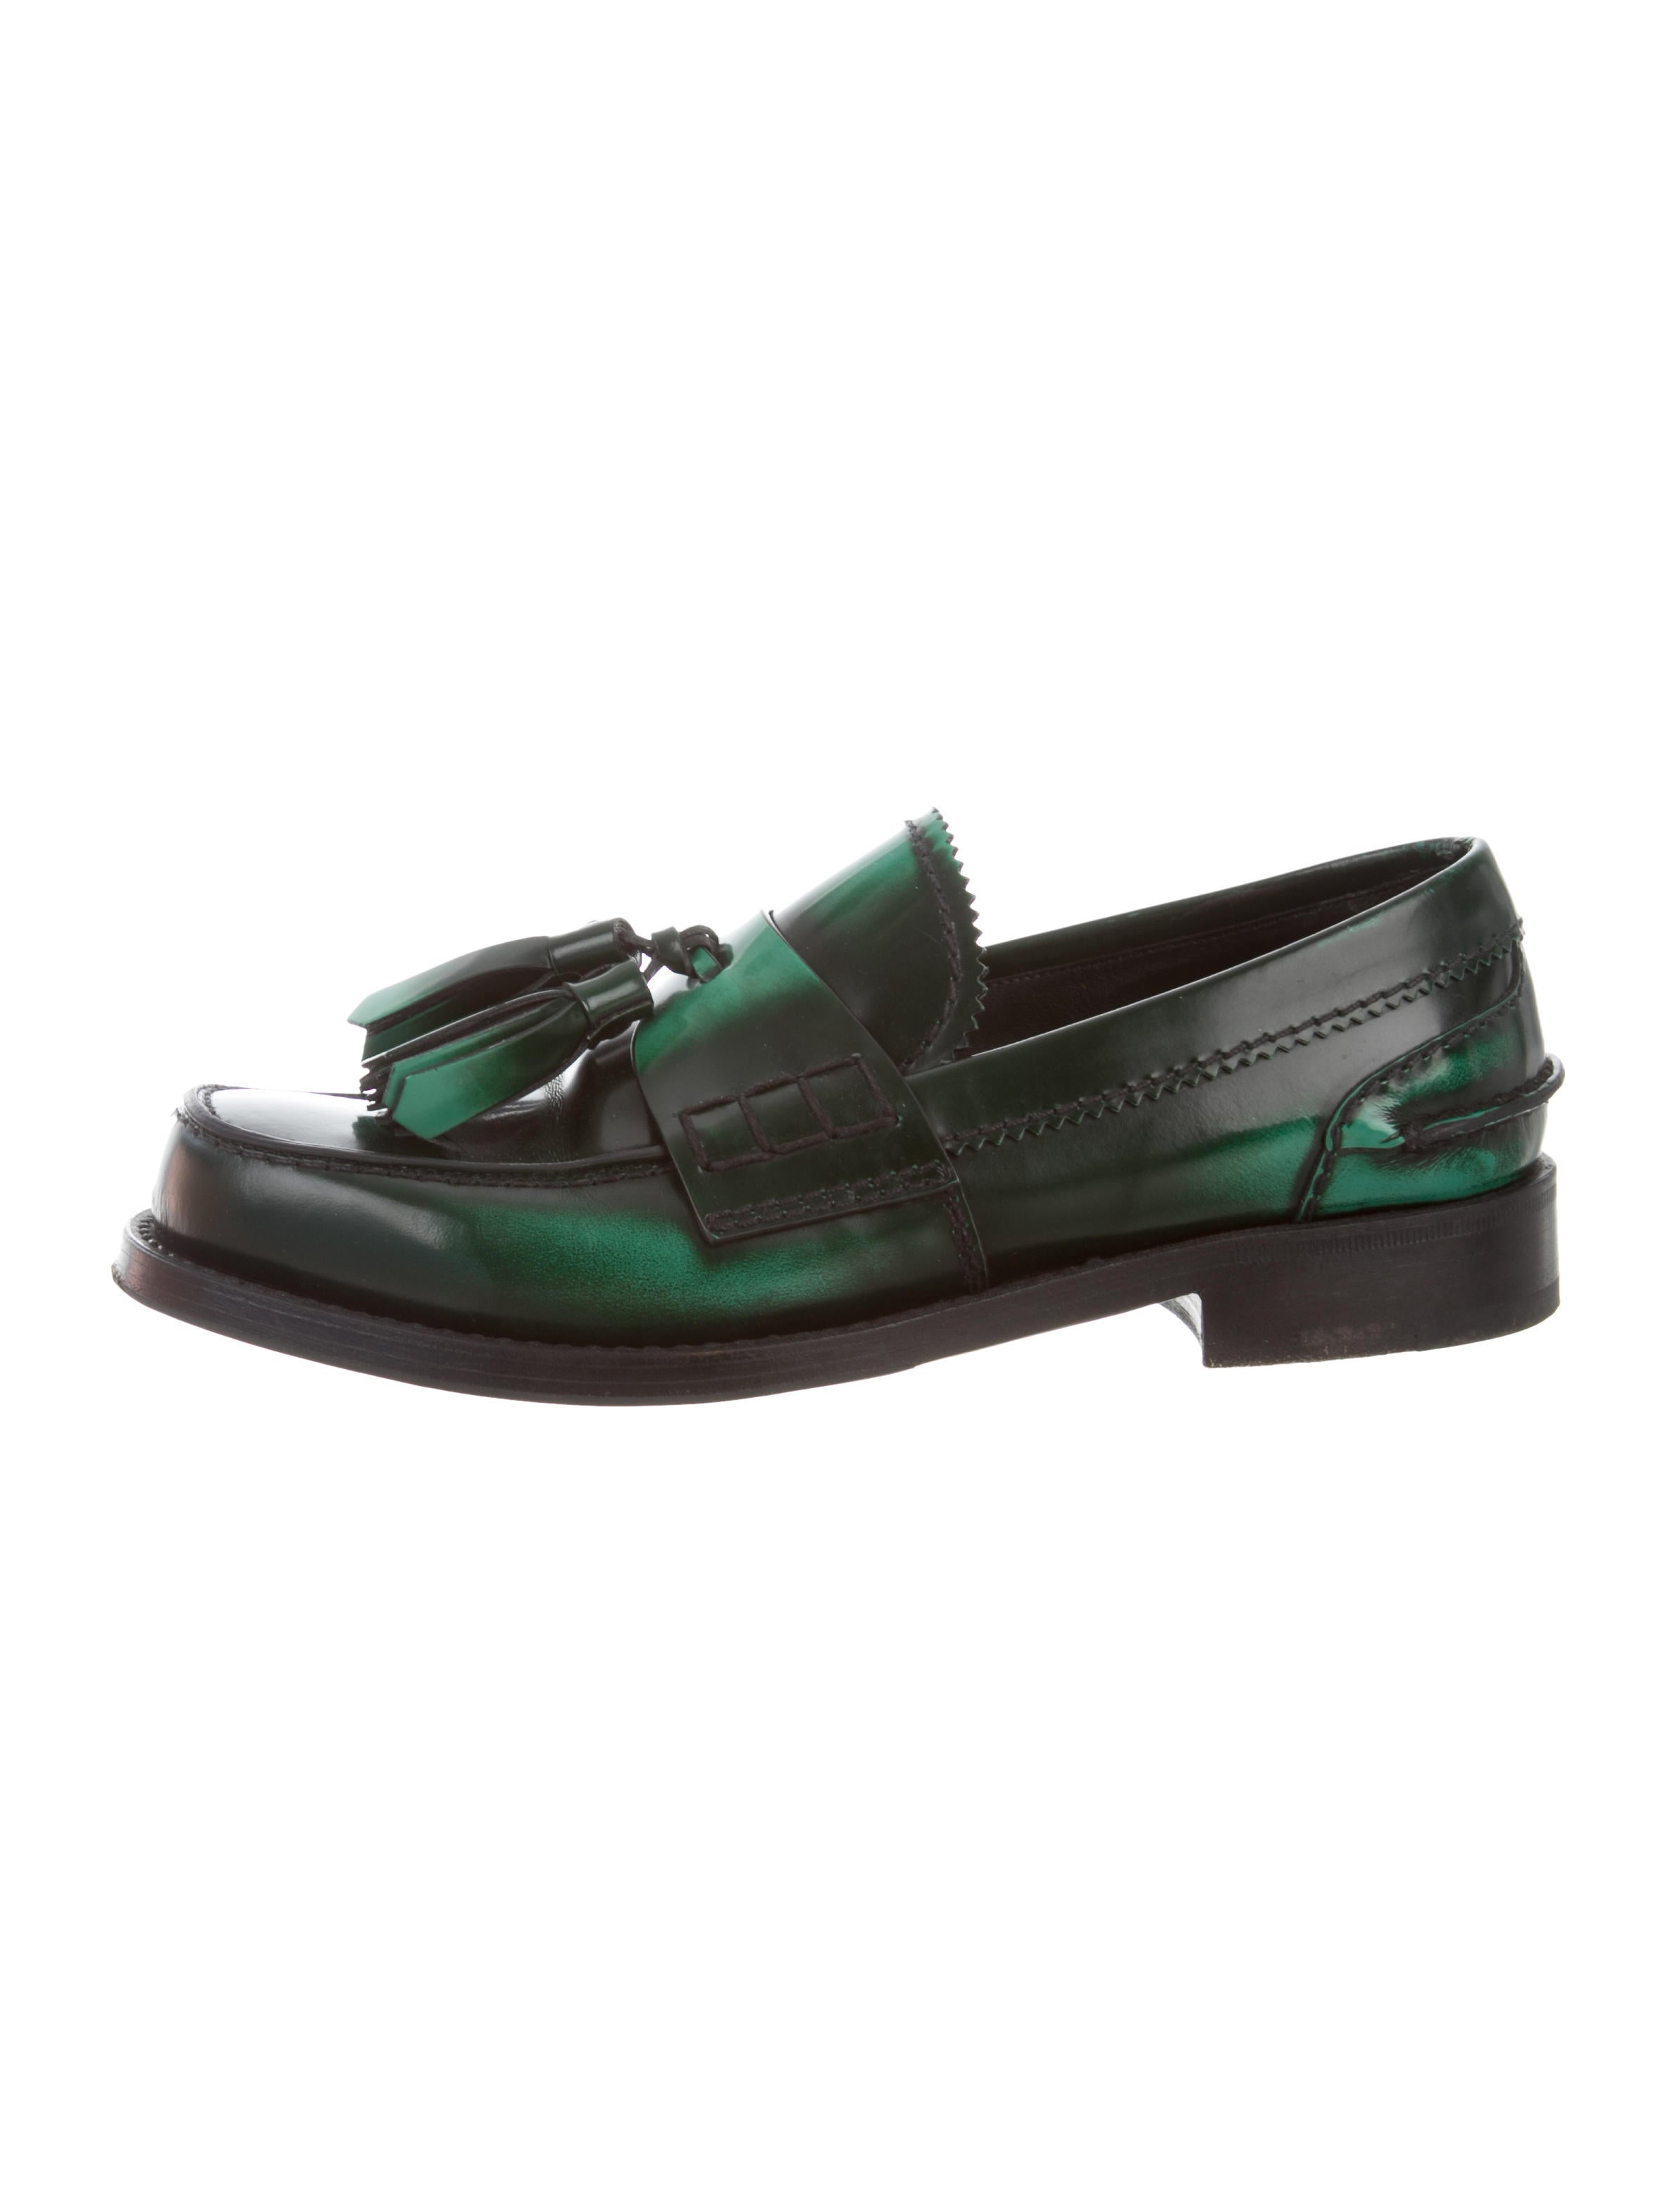 Prada Spazzolato Tassel Loafers - Shoes